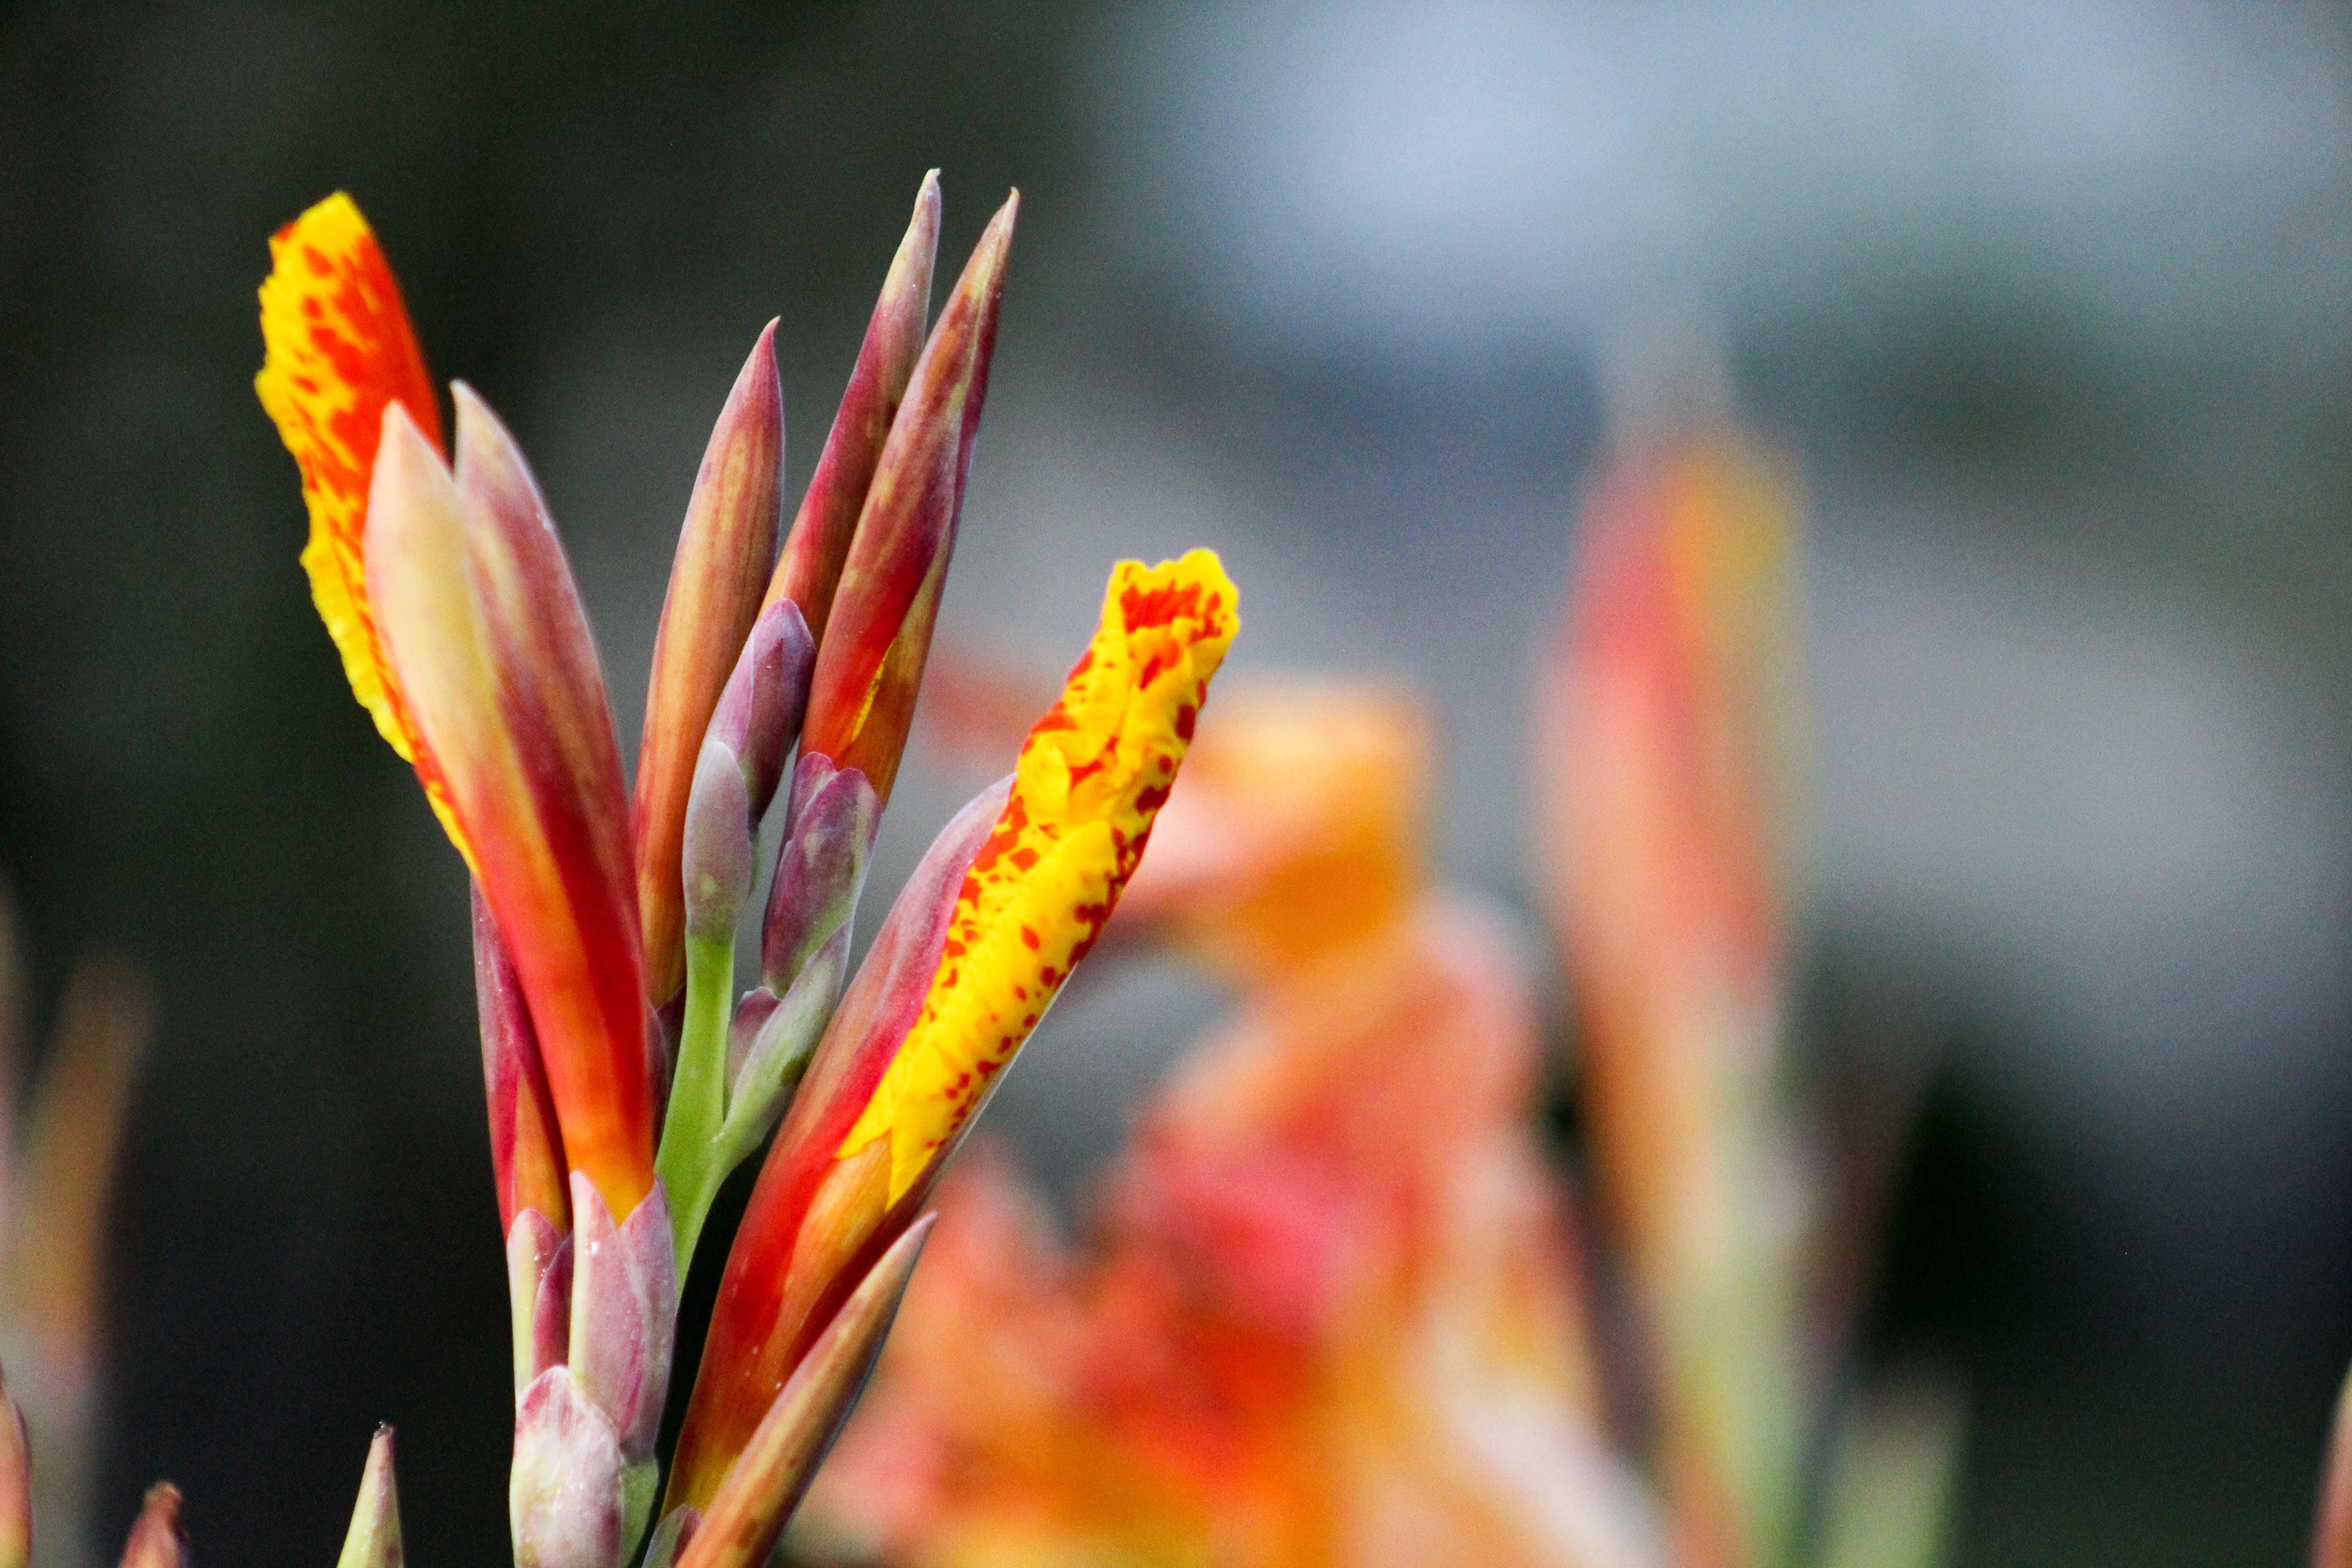 Gratis stockfoto met canna, oranje en geel, oranje en gele bloem